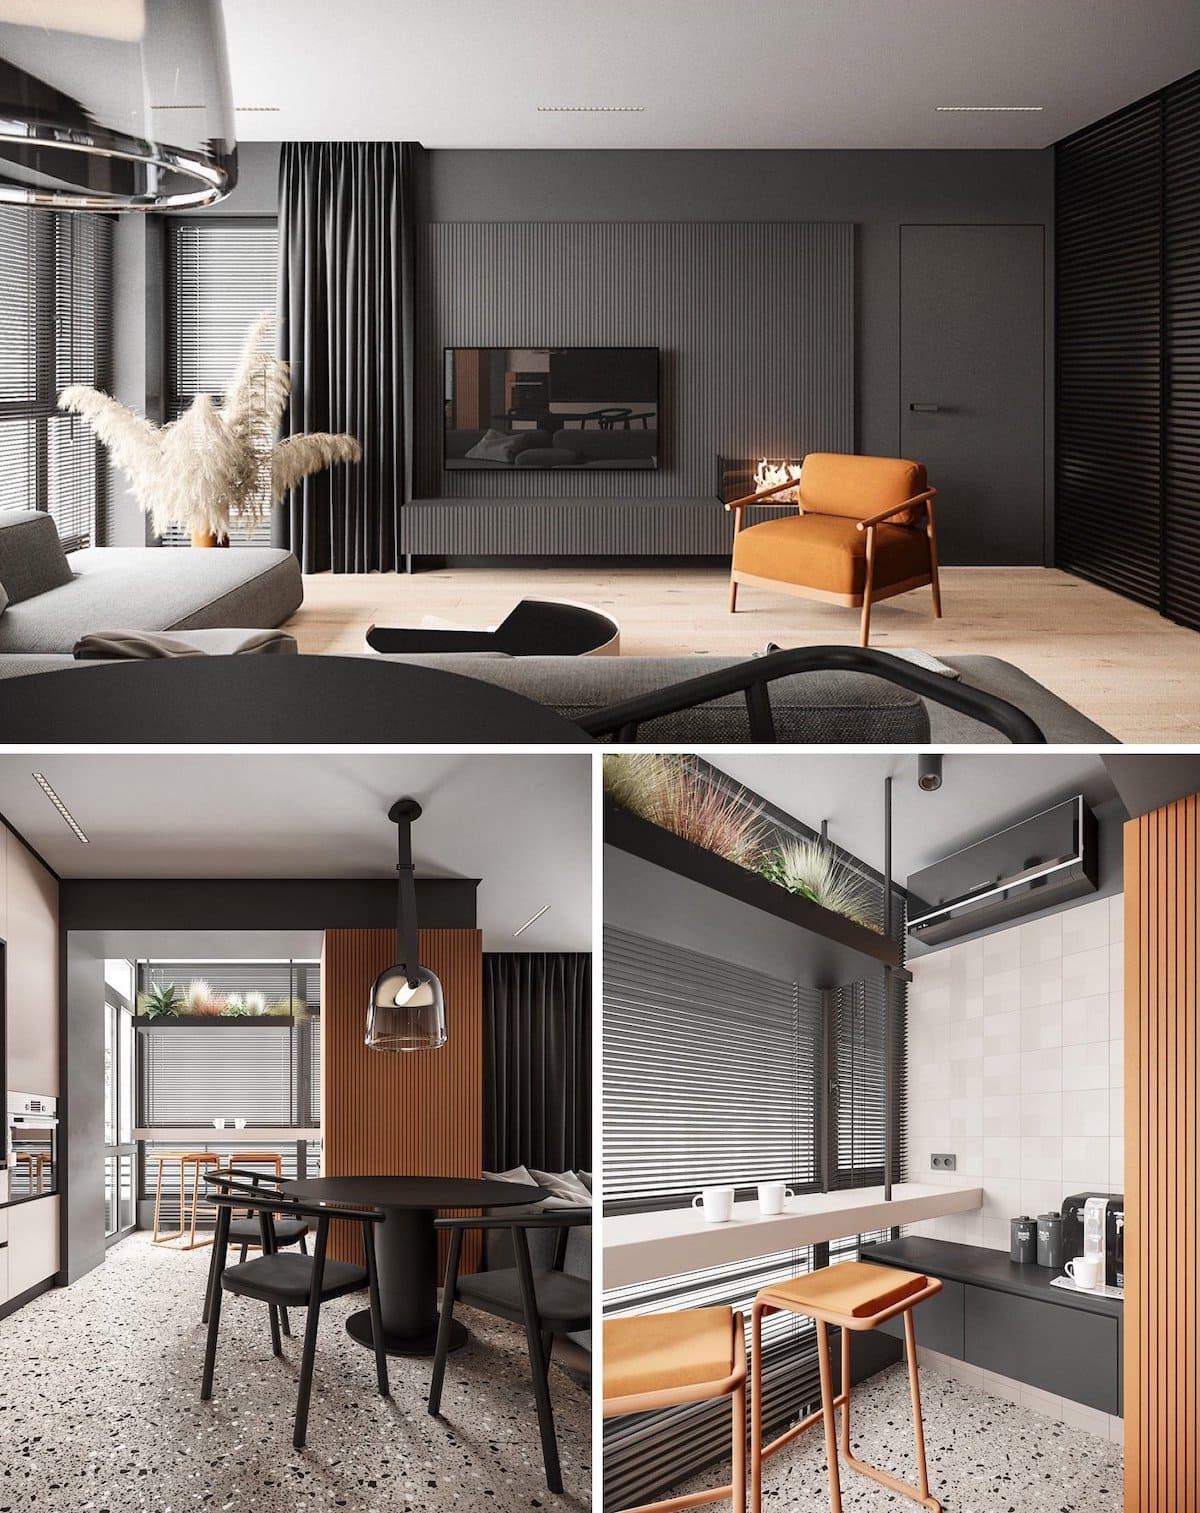 модный дизайн интерьера квартиры фото 75